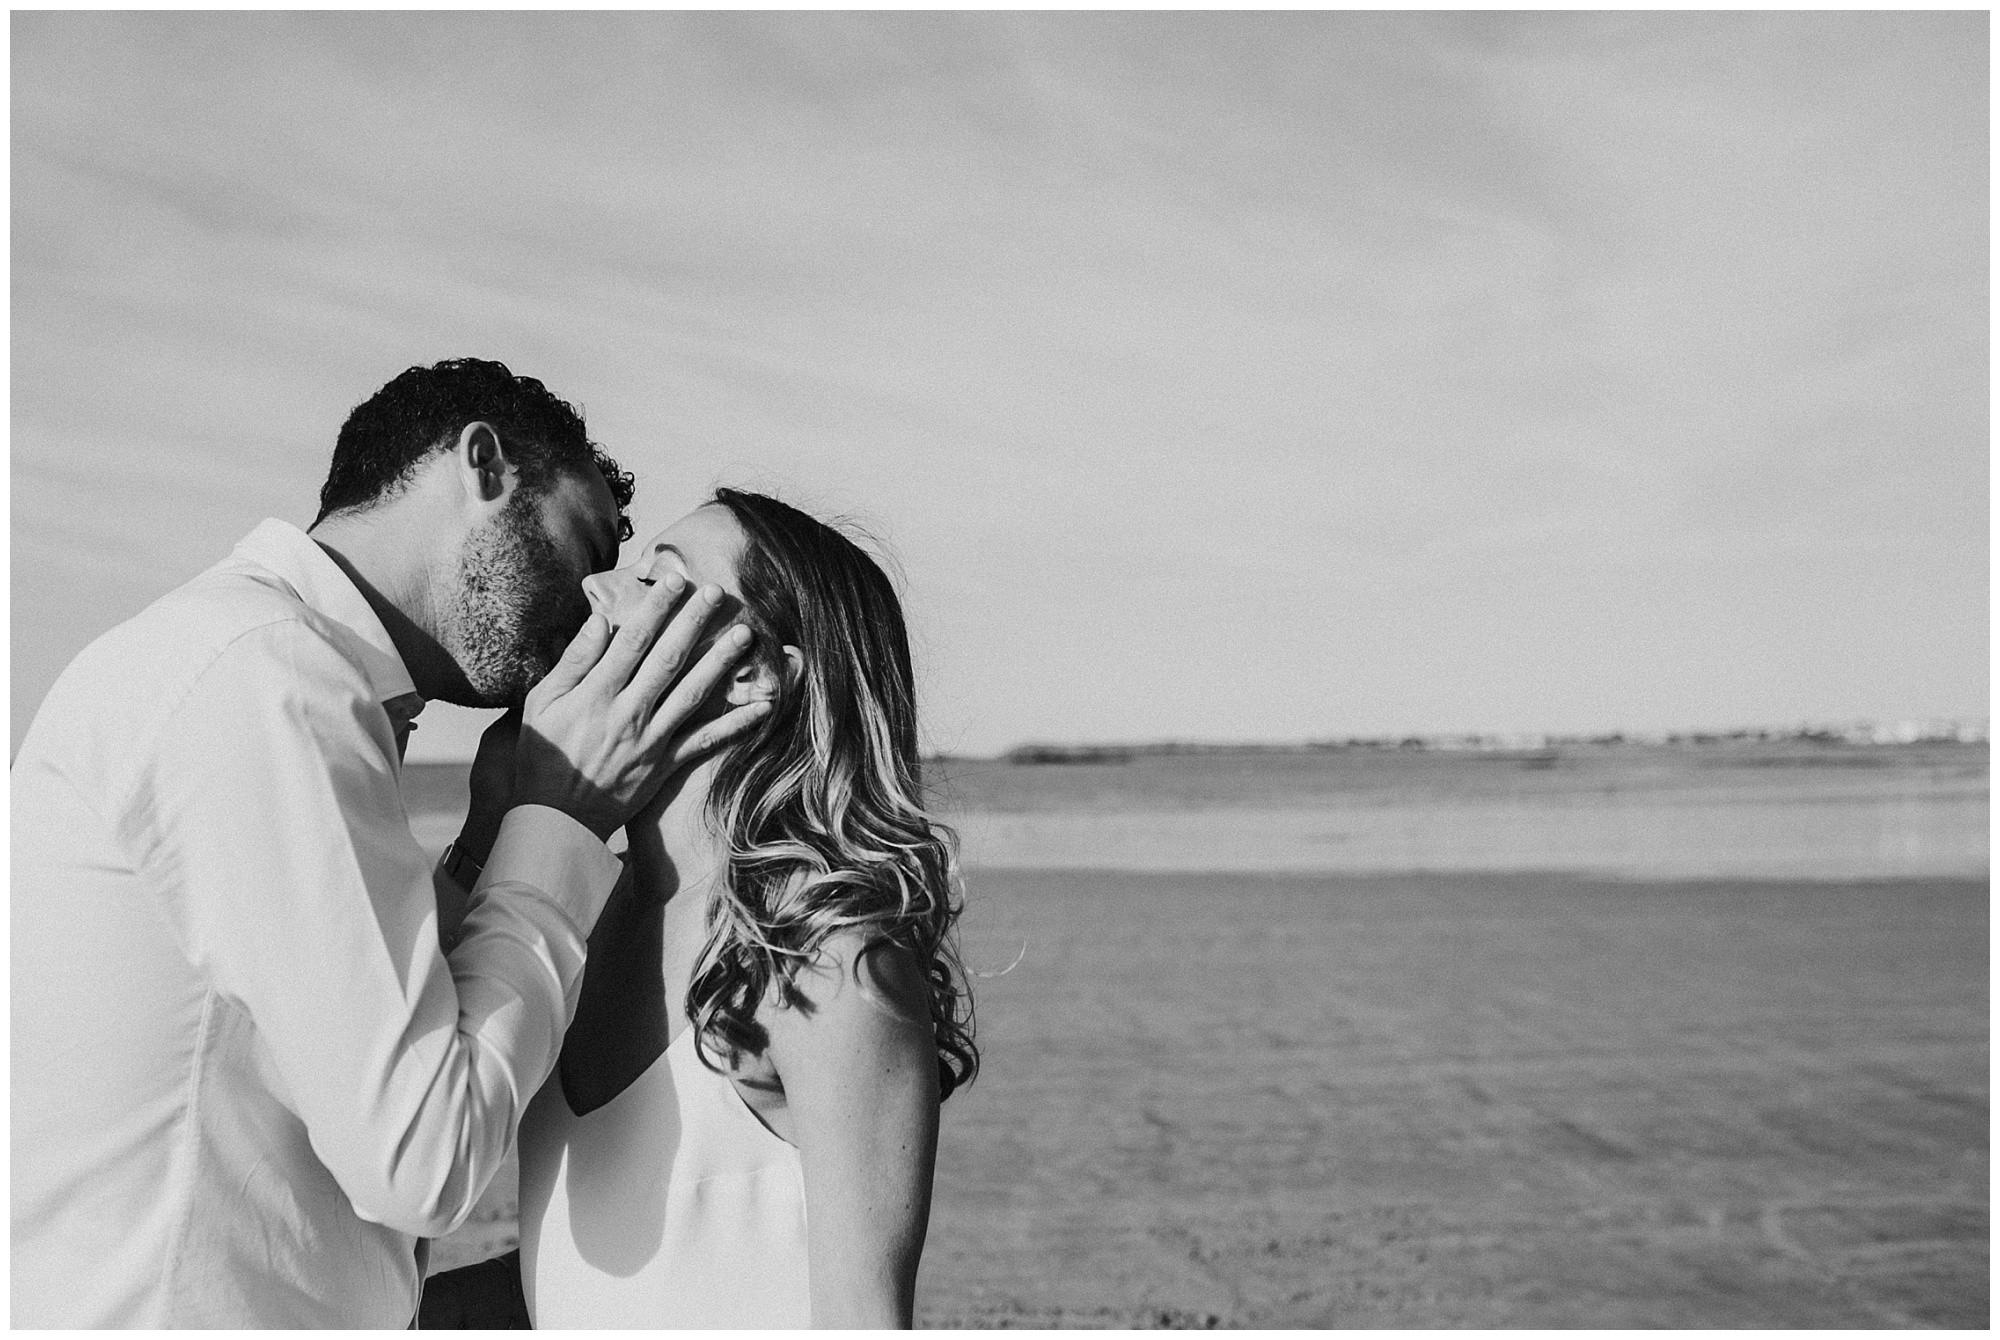 Kateryna-photos-photographe-mariage-bretagne-saint-malo-finistere-cotes-darmor-wedding_0068.jpg